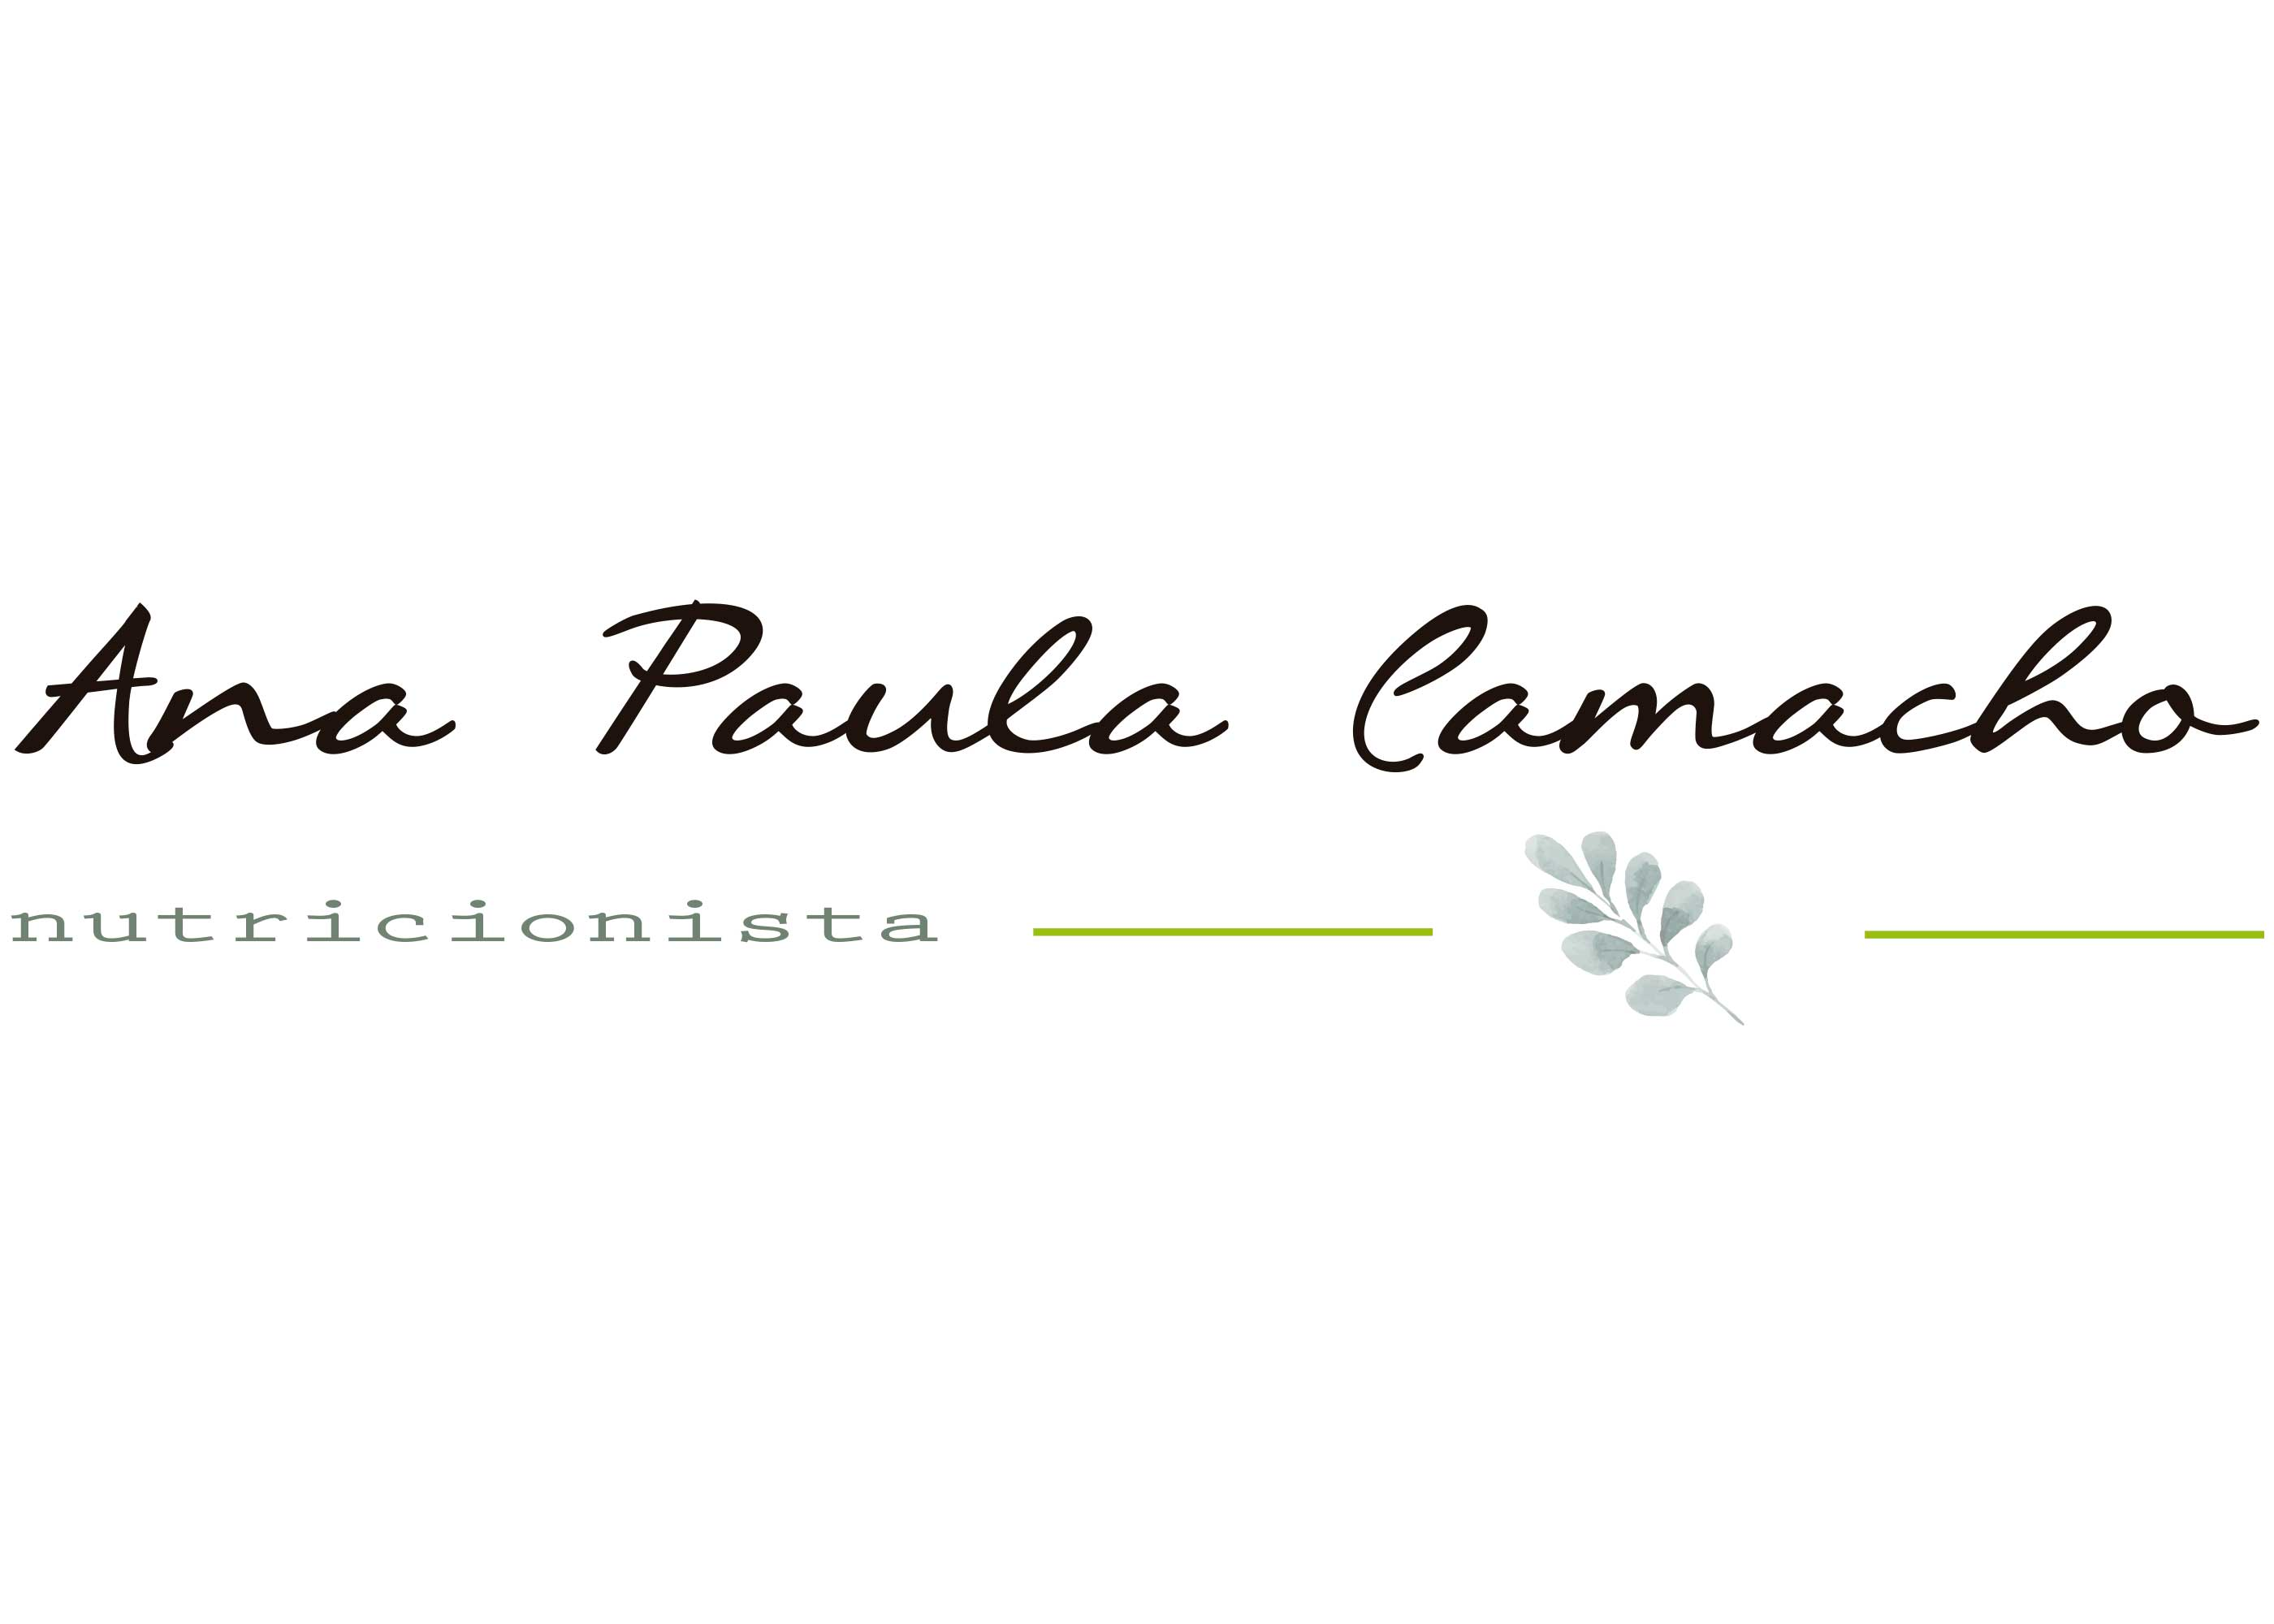 logo Ana Paula Camacho nutri